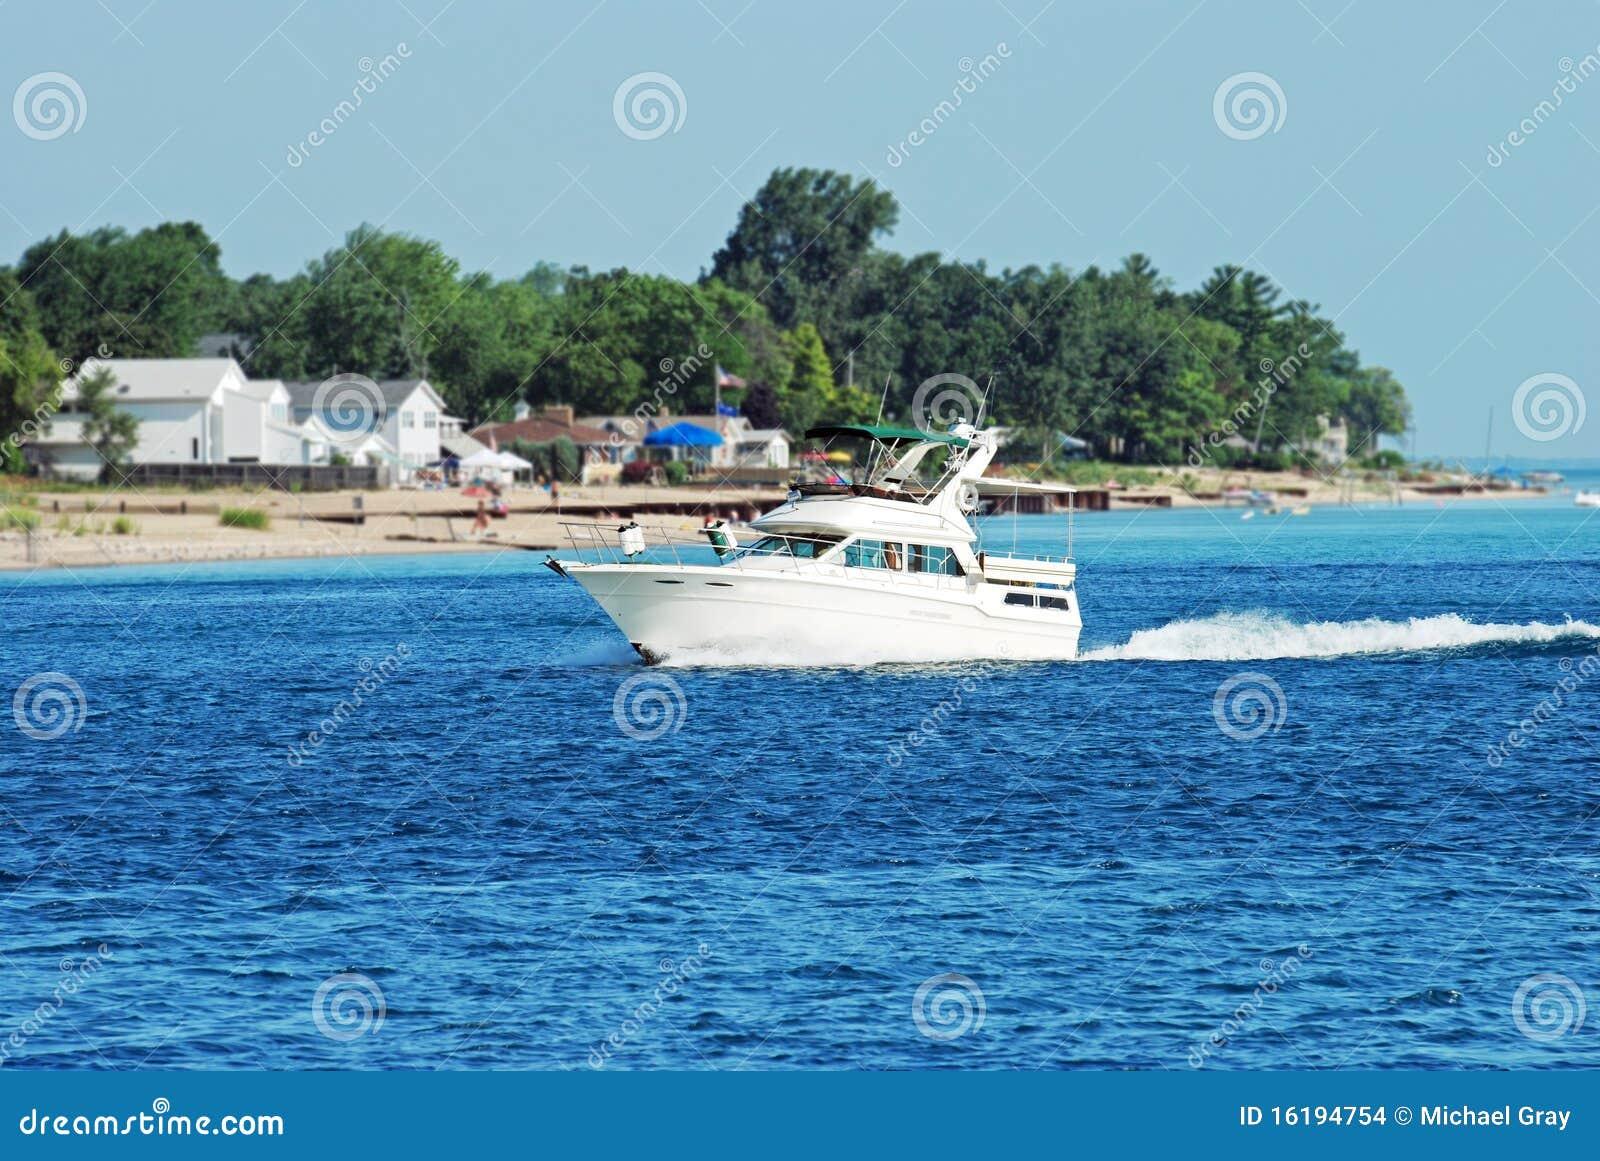 Bootfahrt durch den Strand